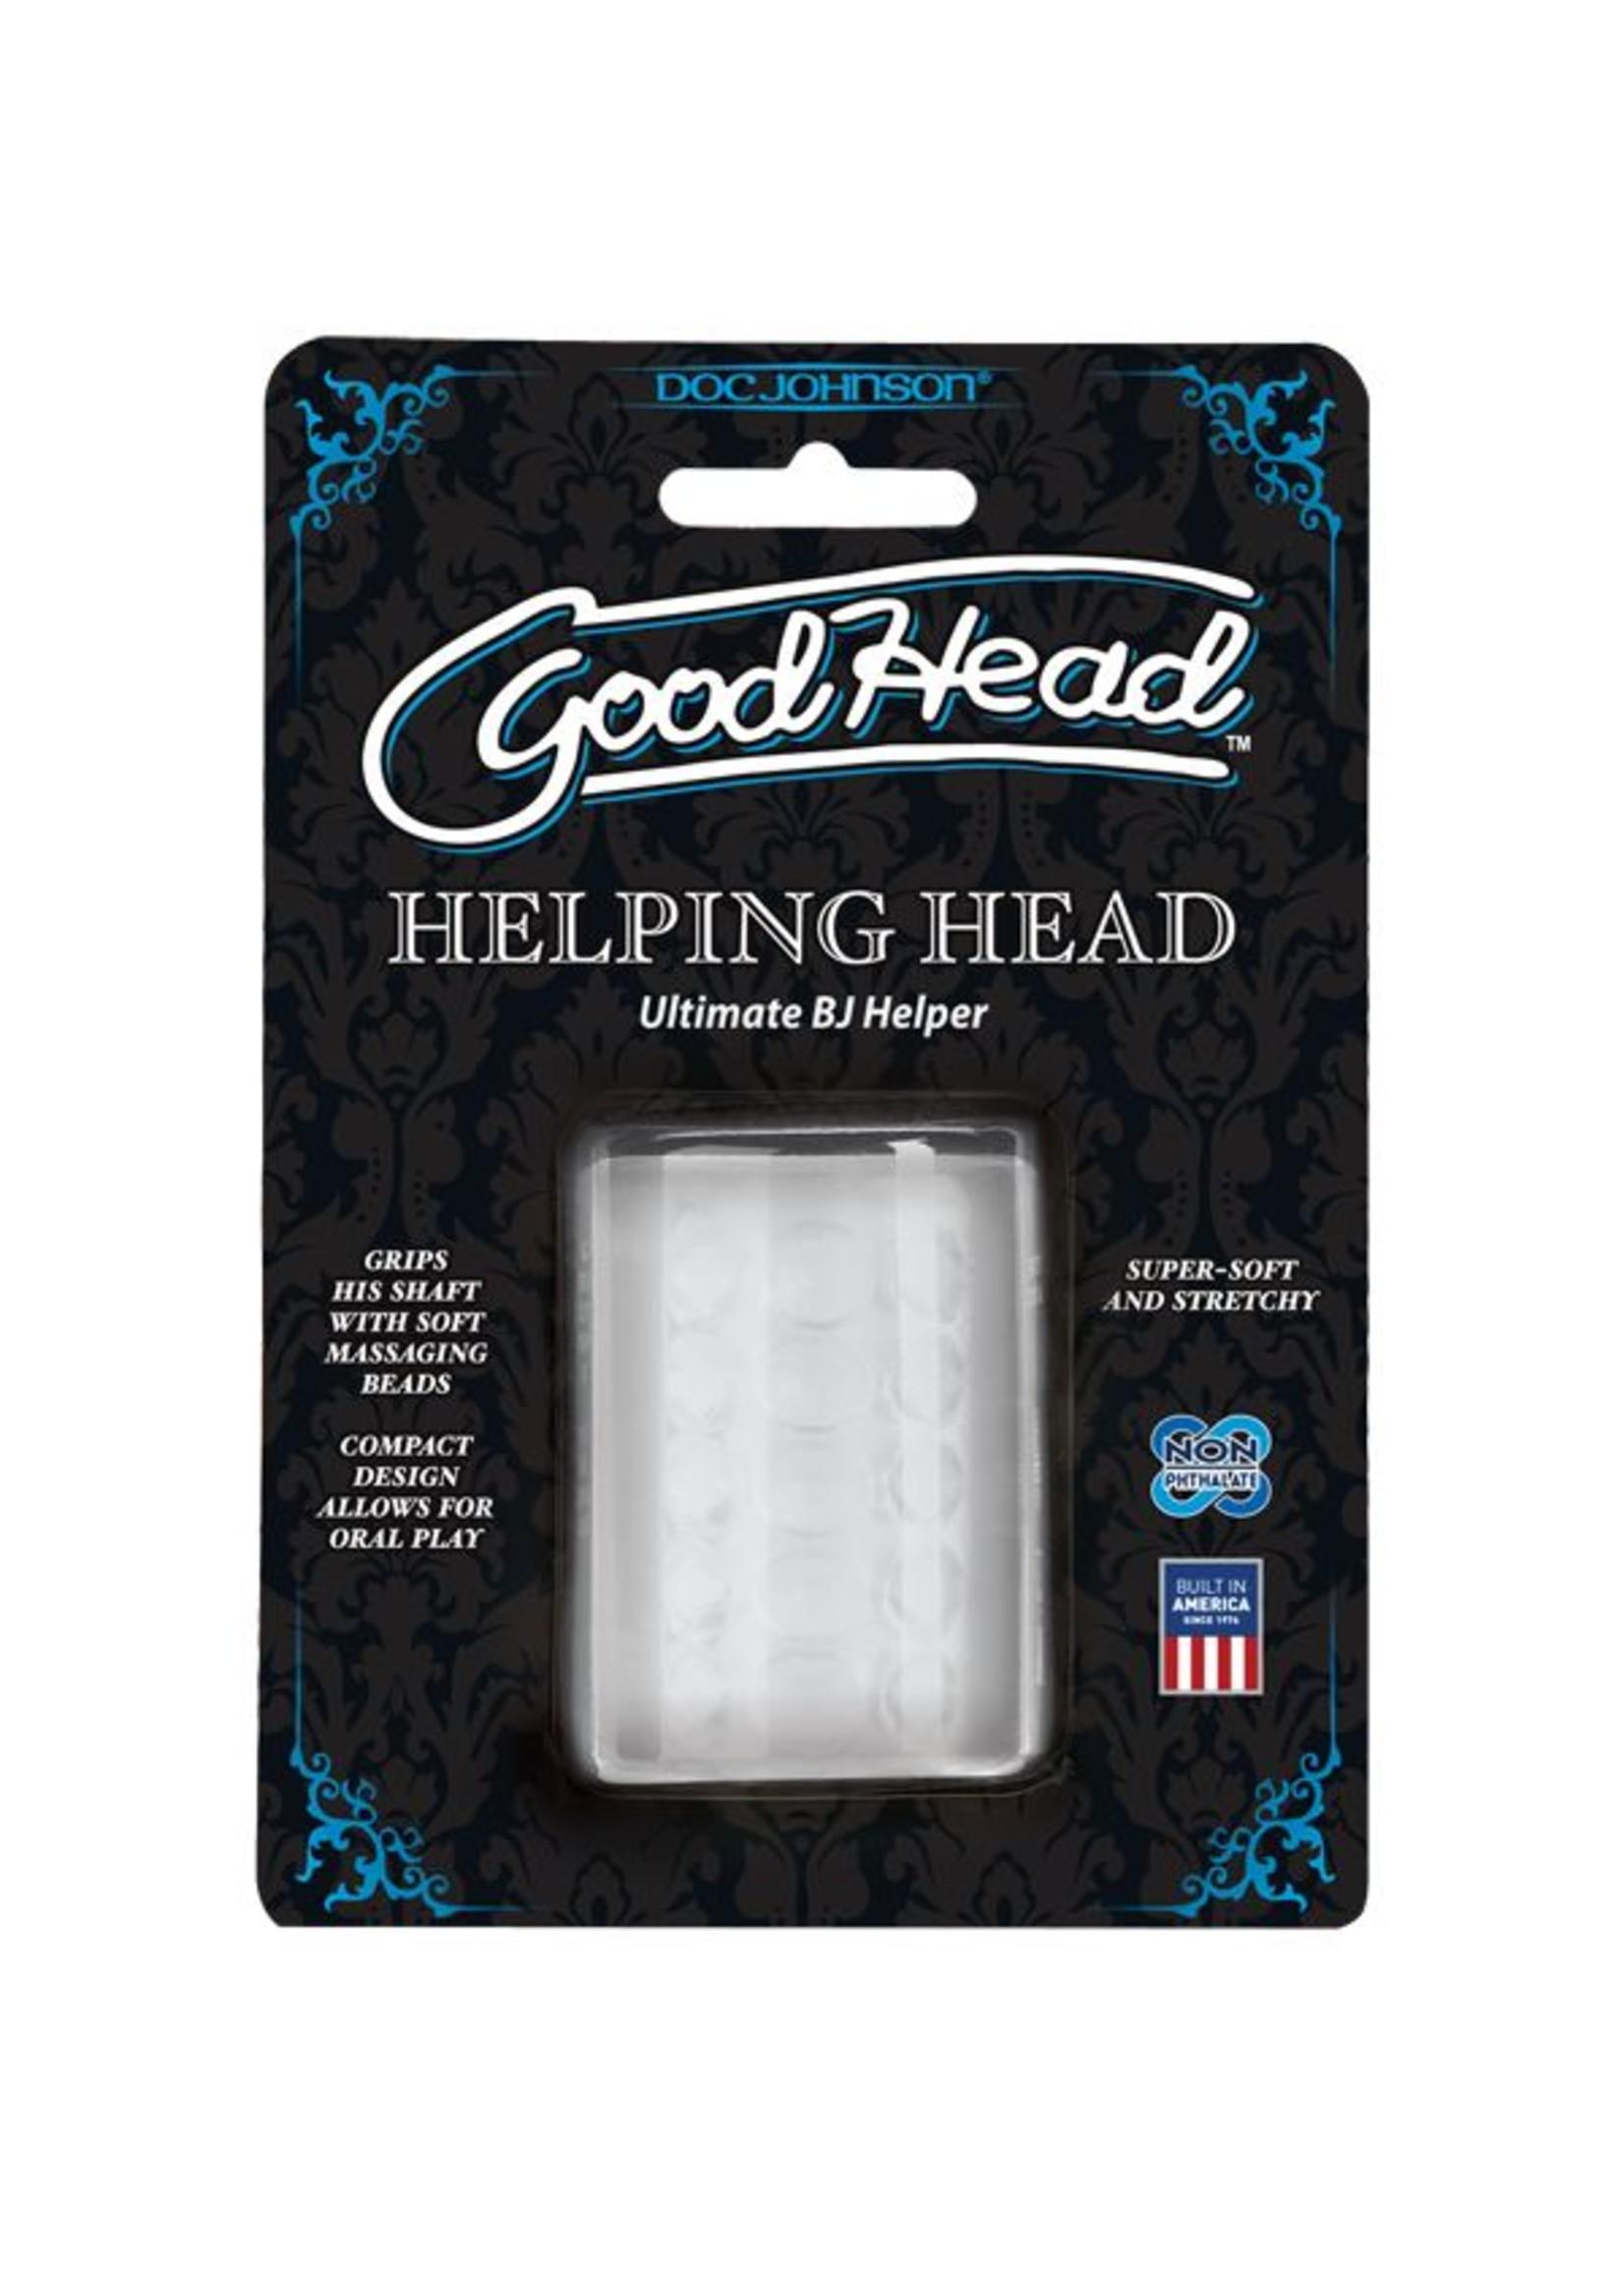 Doc Johnson GOOD HEAD HELPING HAND